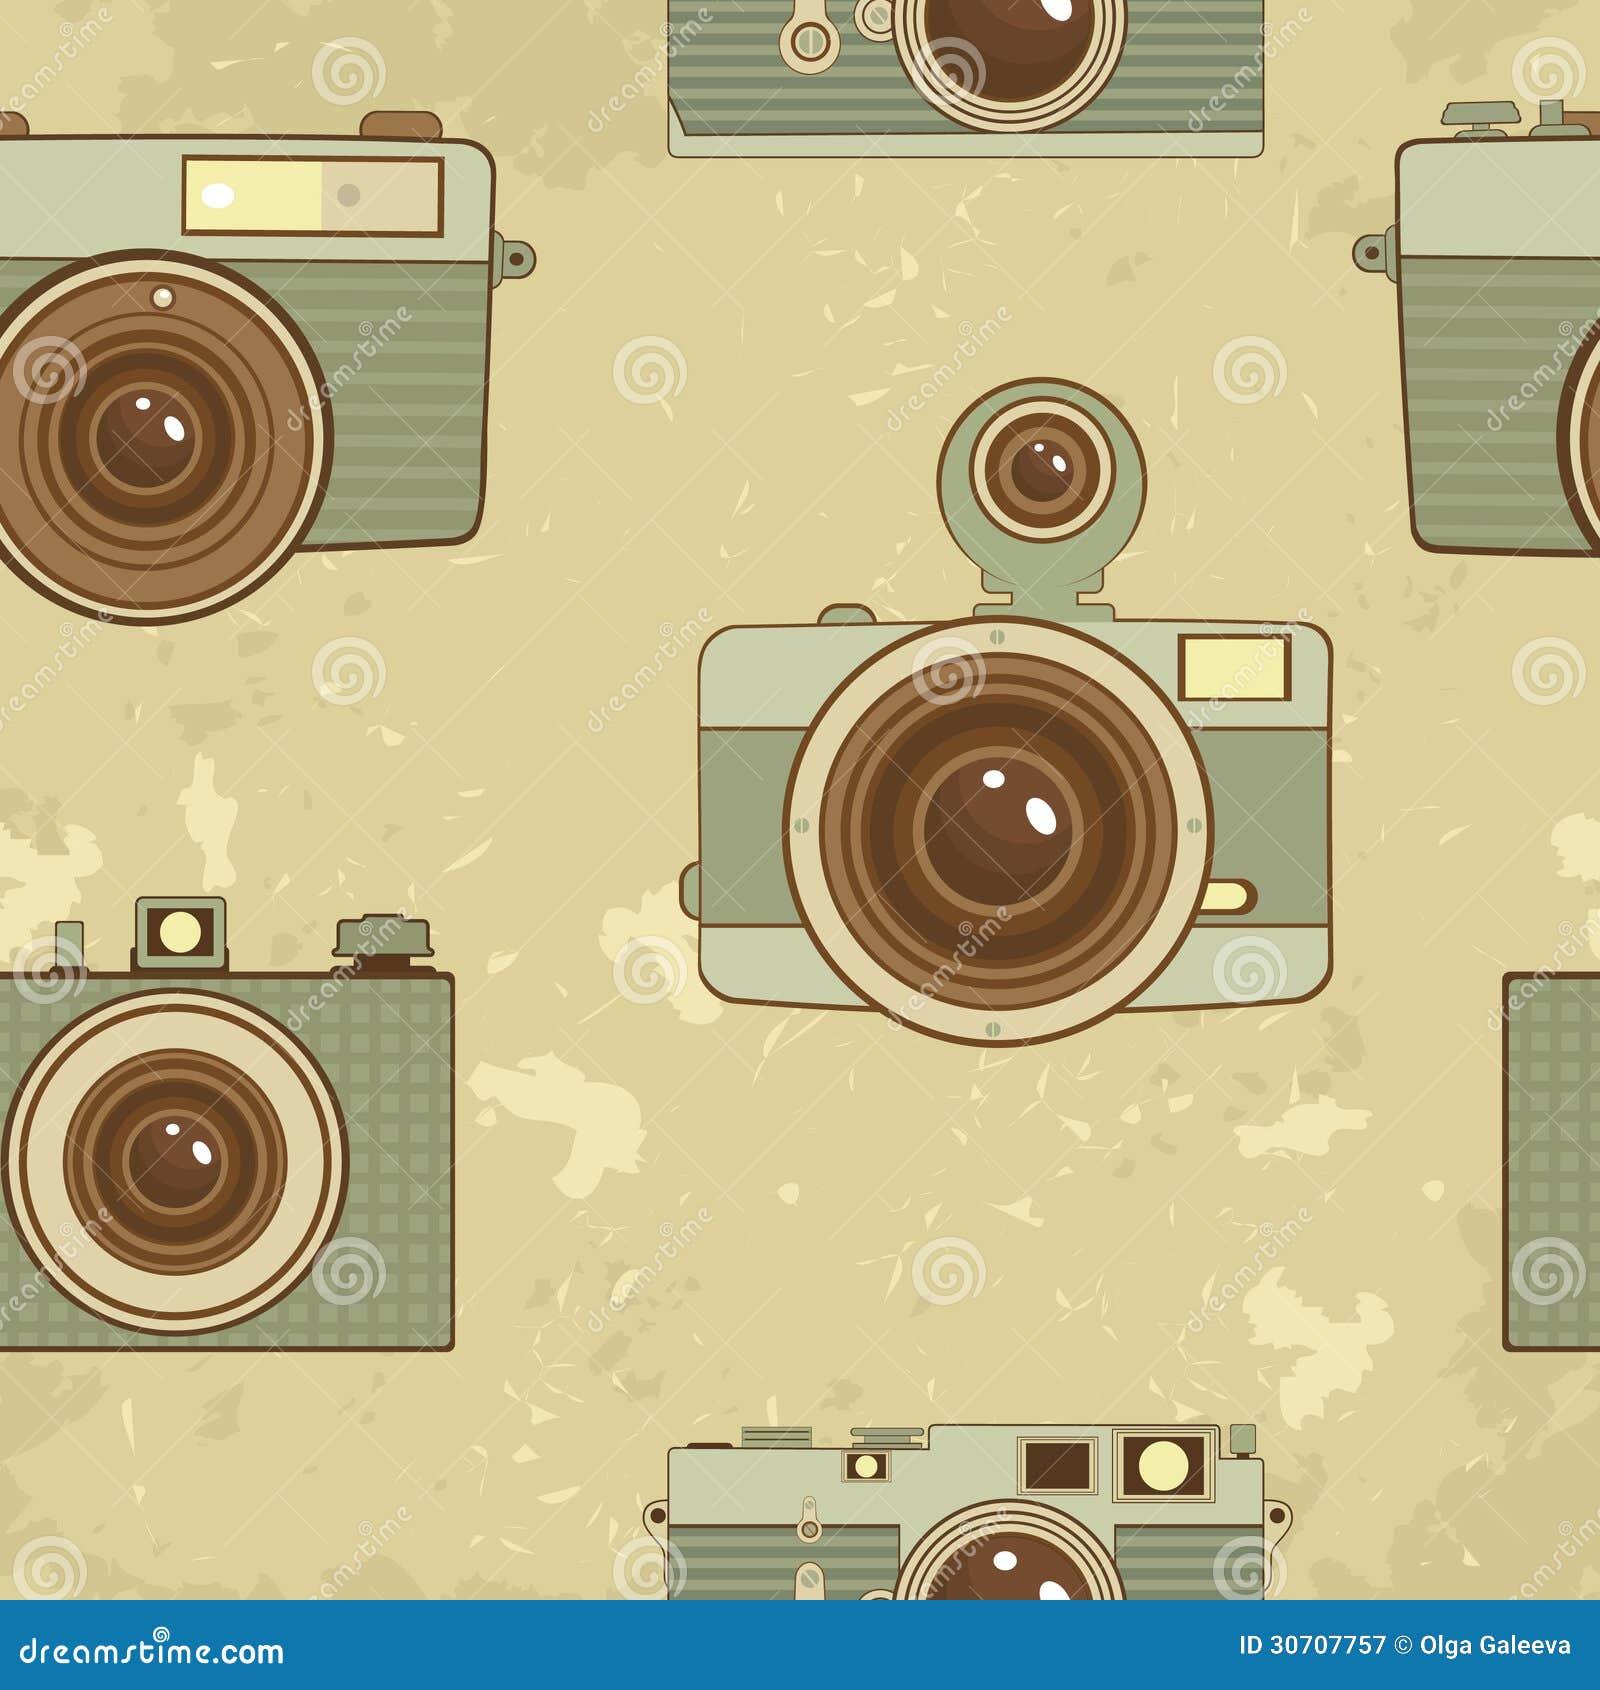 Vintage Camera Backgrounds Old style cameras background Vintage Camera Backgrounds